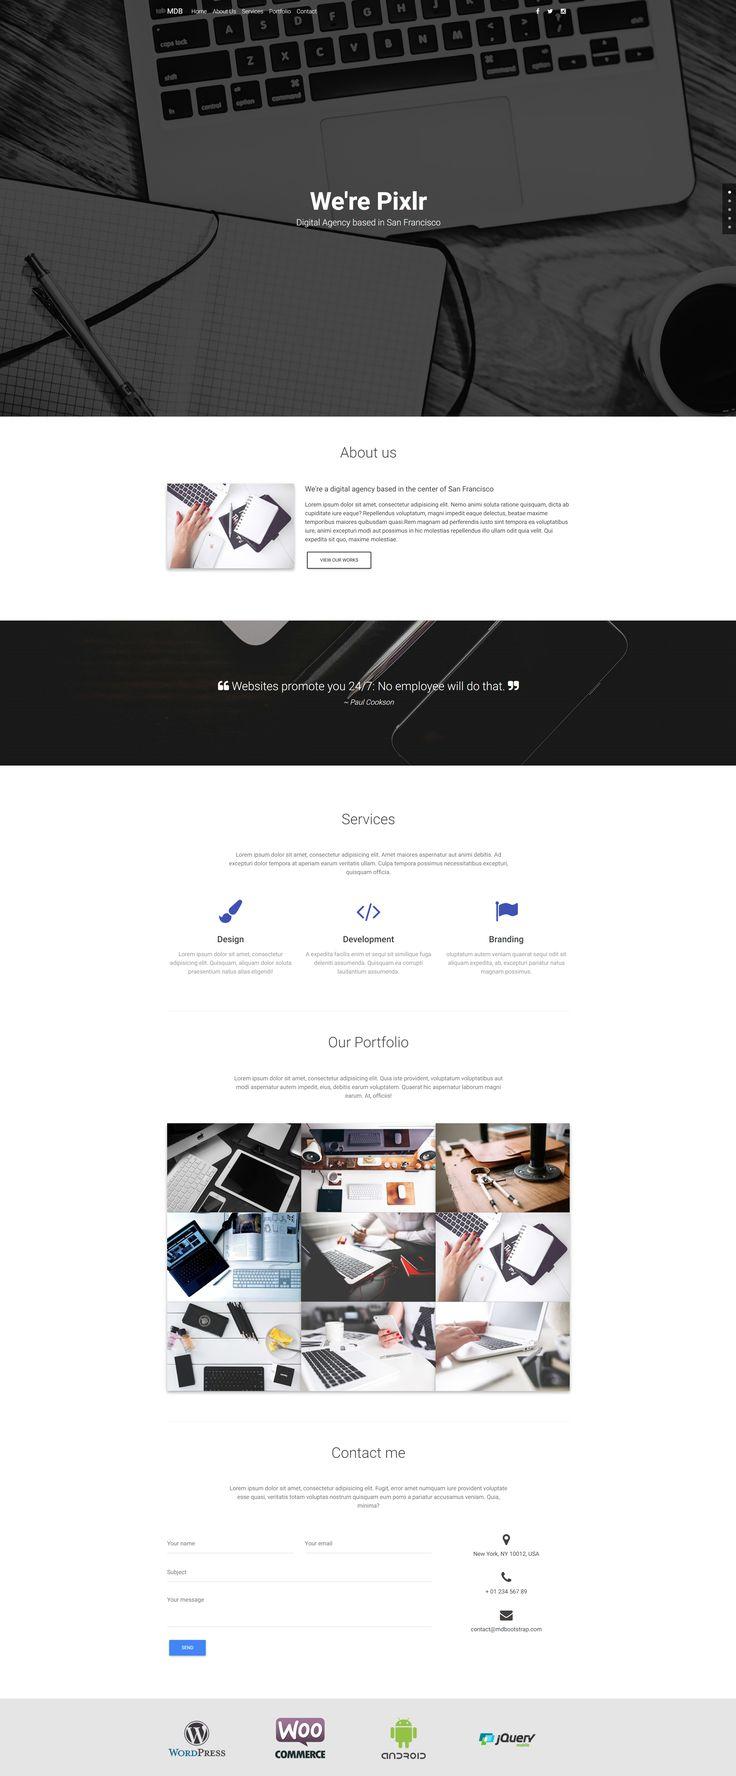 Responsive, Material Design Creative Agency Portfolio